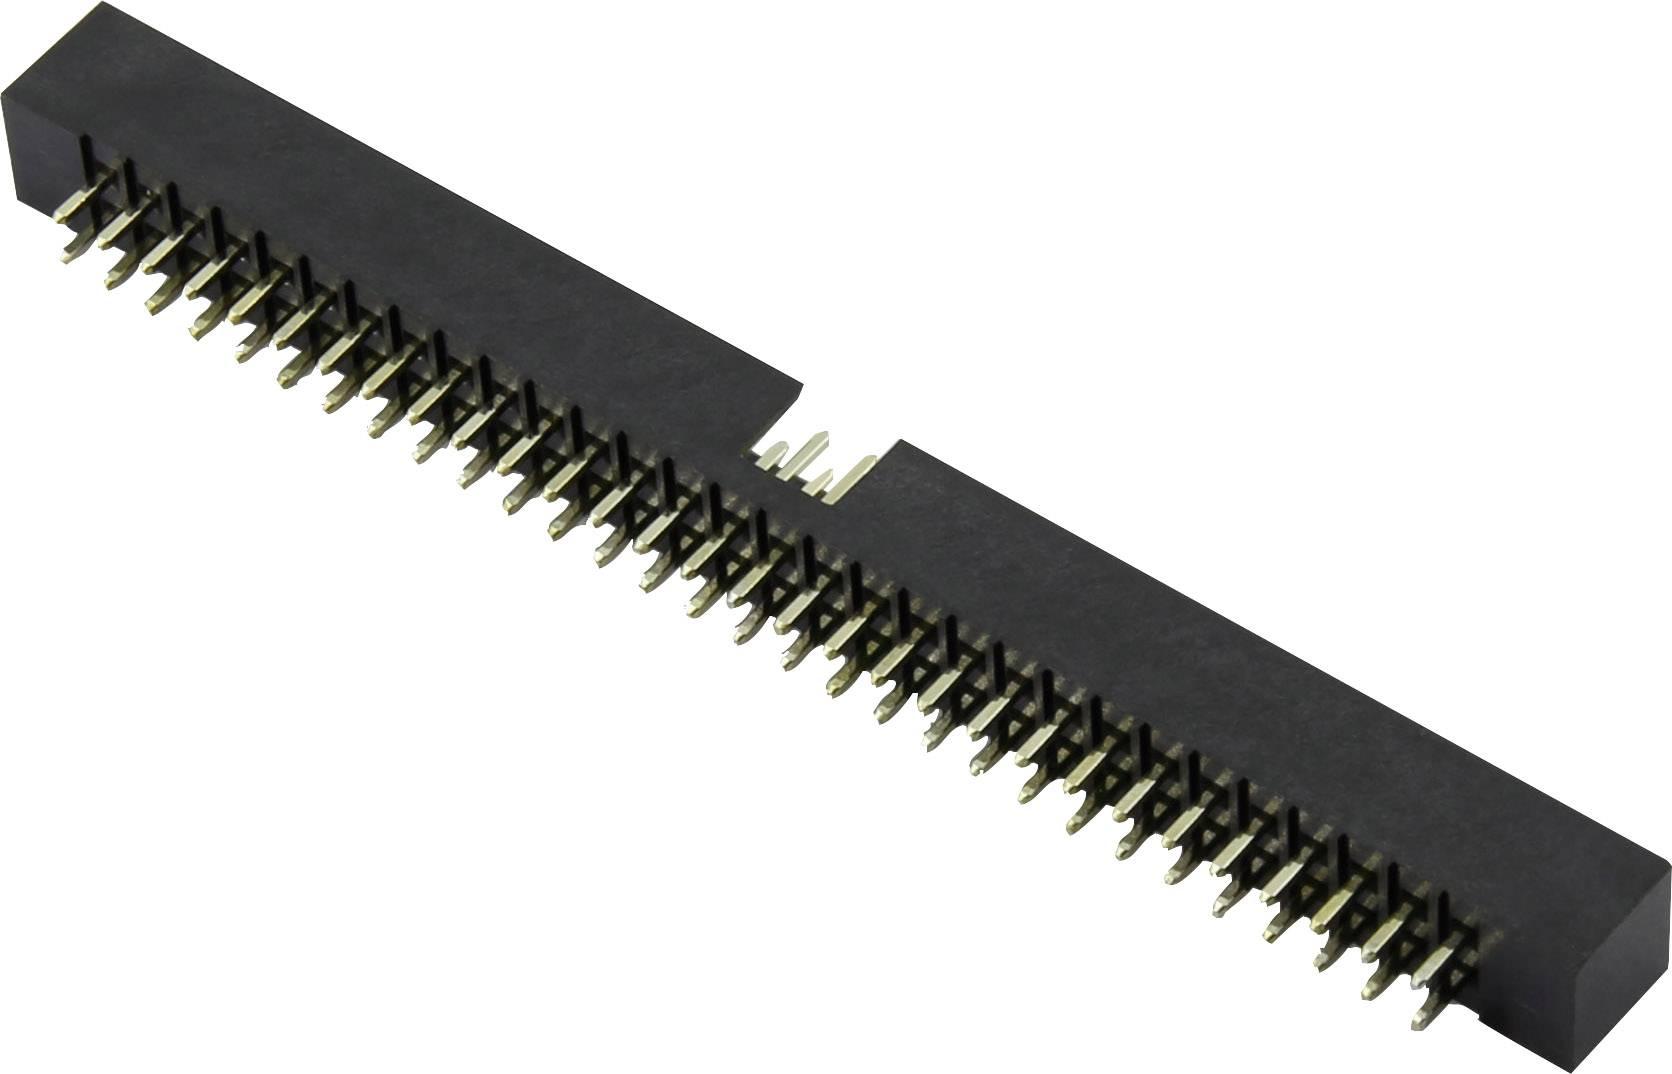 Konektor pro ploché kabely Connfly DS1014-20SF1B, rastr (rozteč): 2 mm, počet pólů: 20, 1 ks